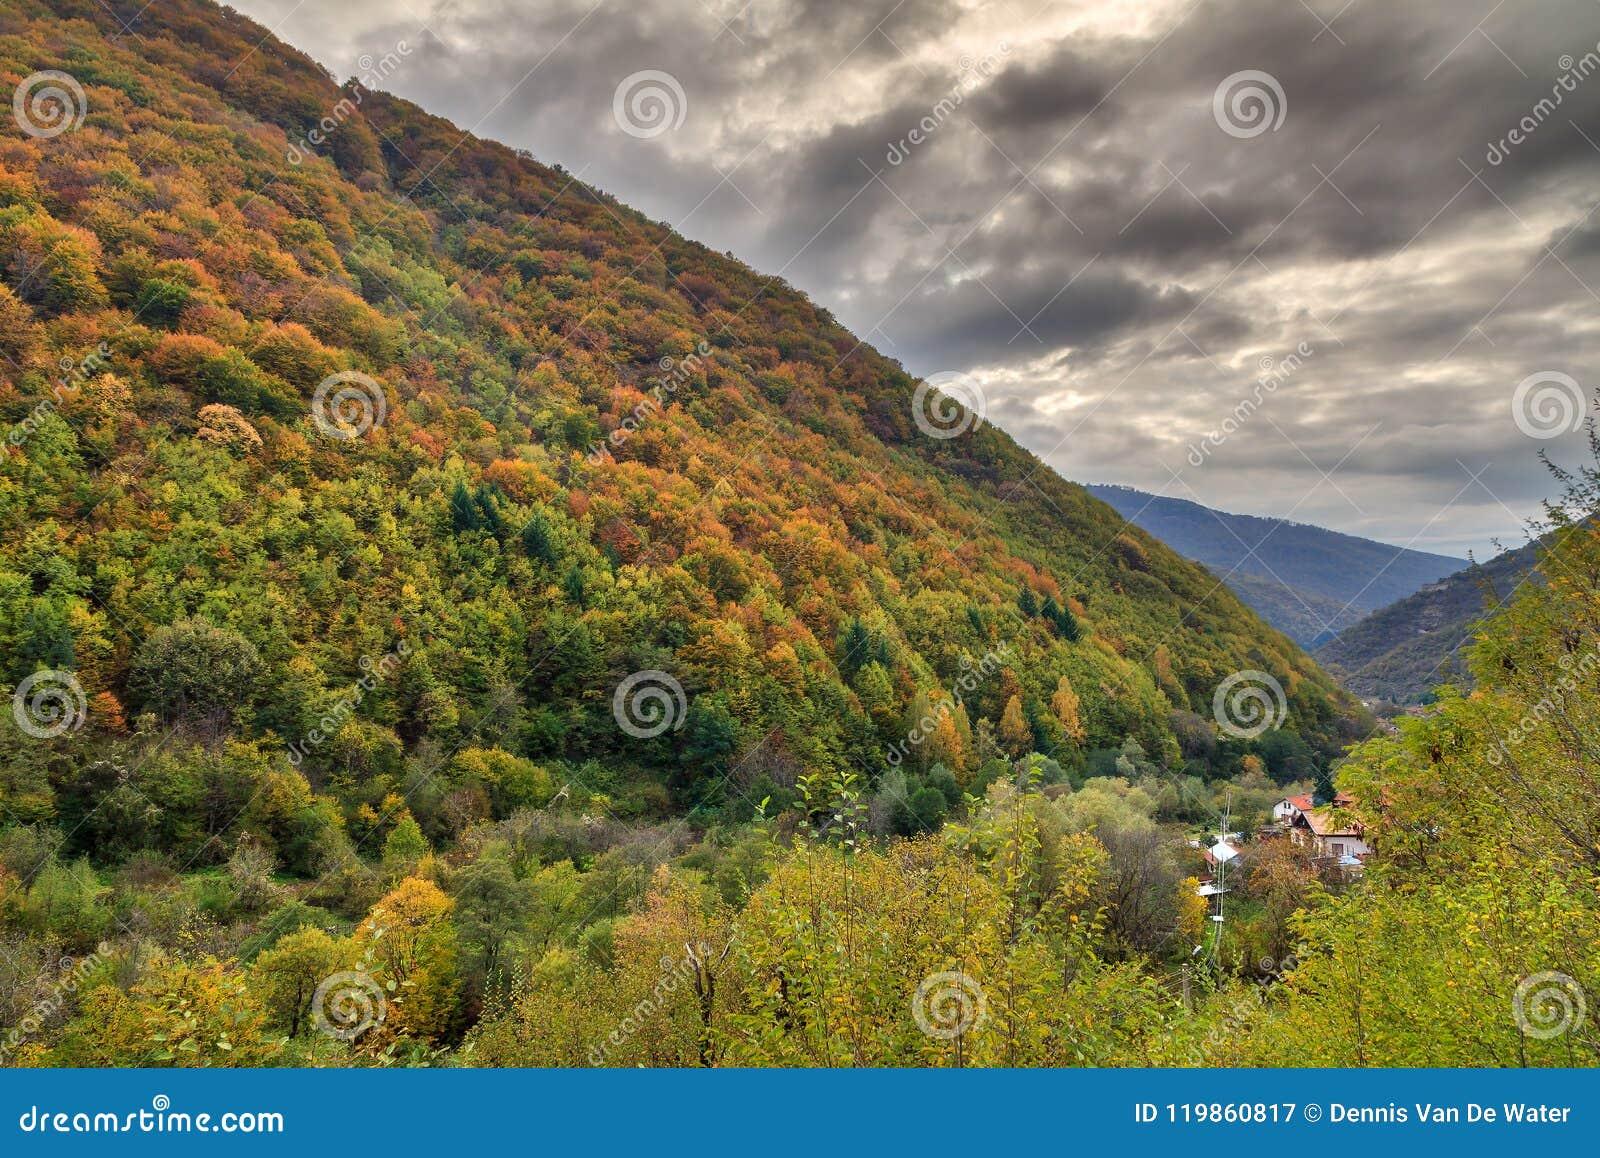 Ominous autumn colors